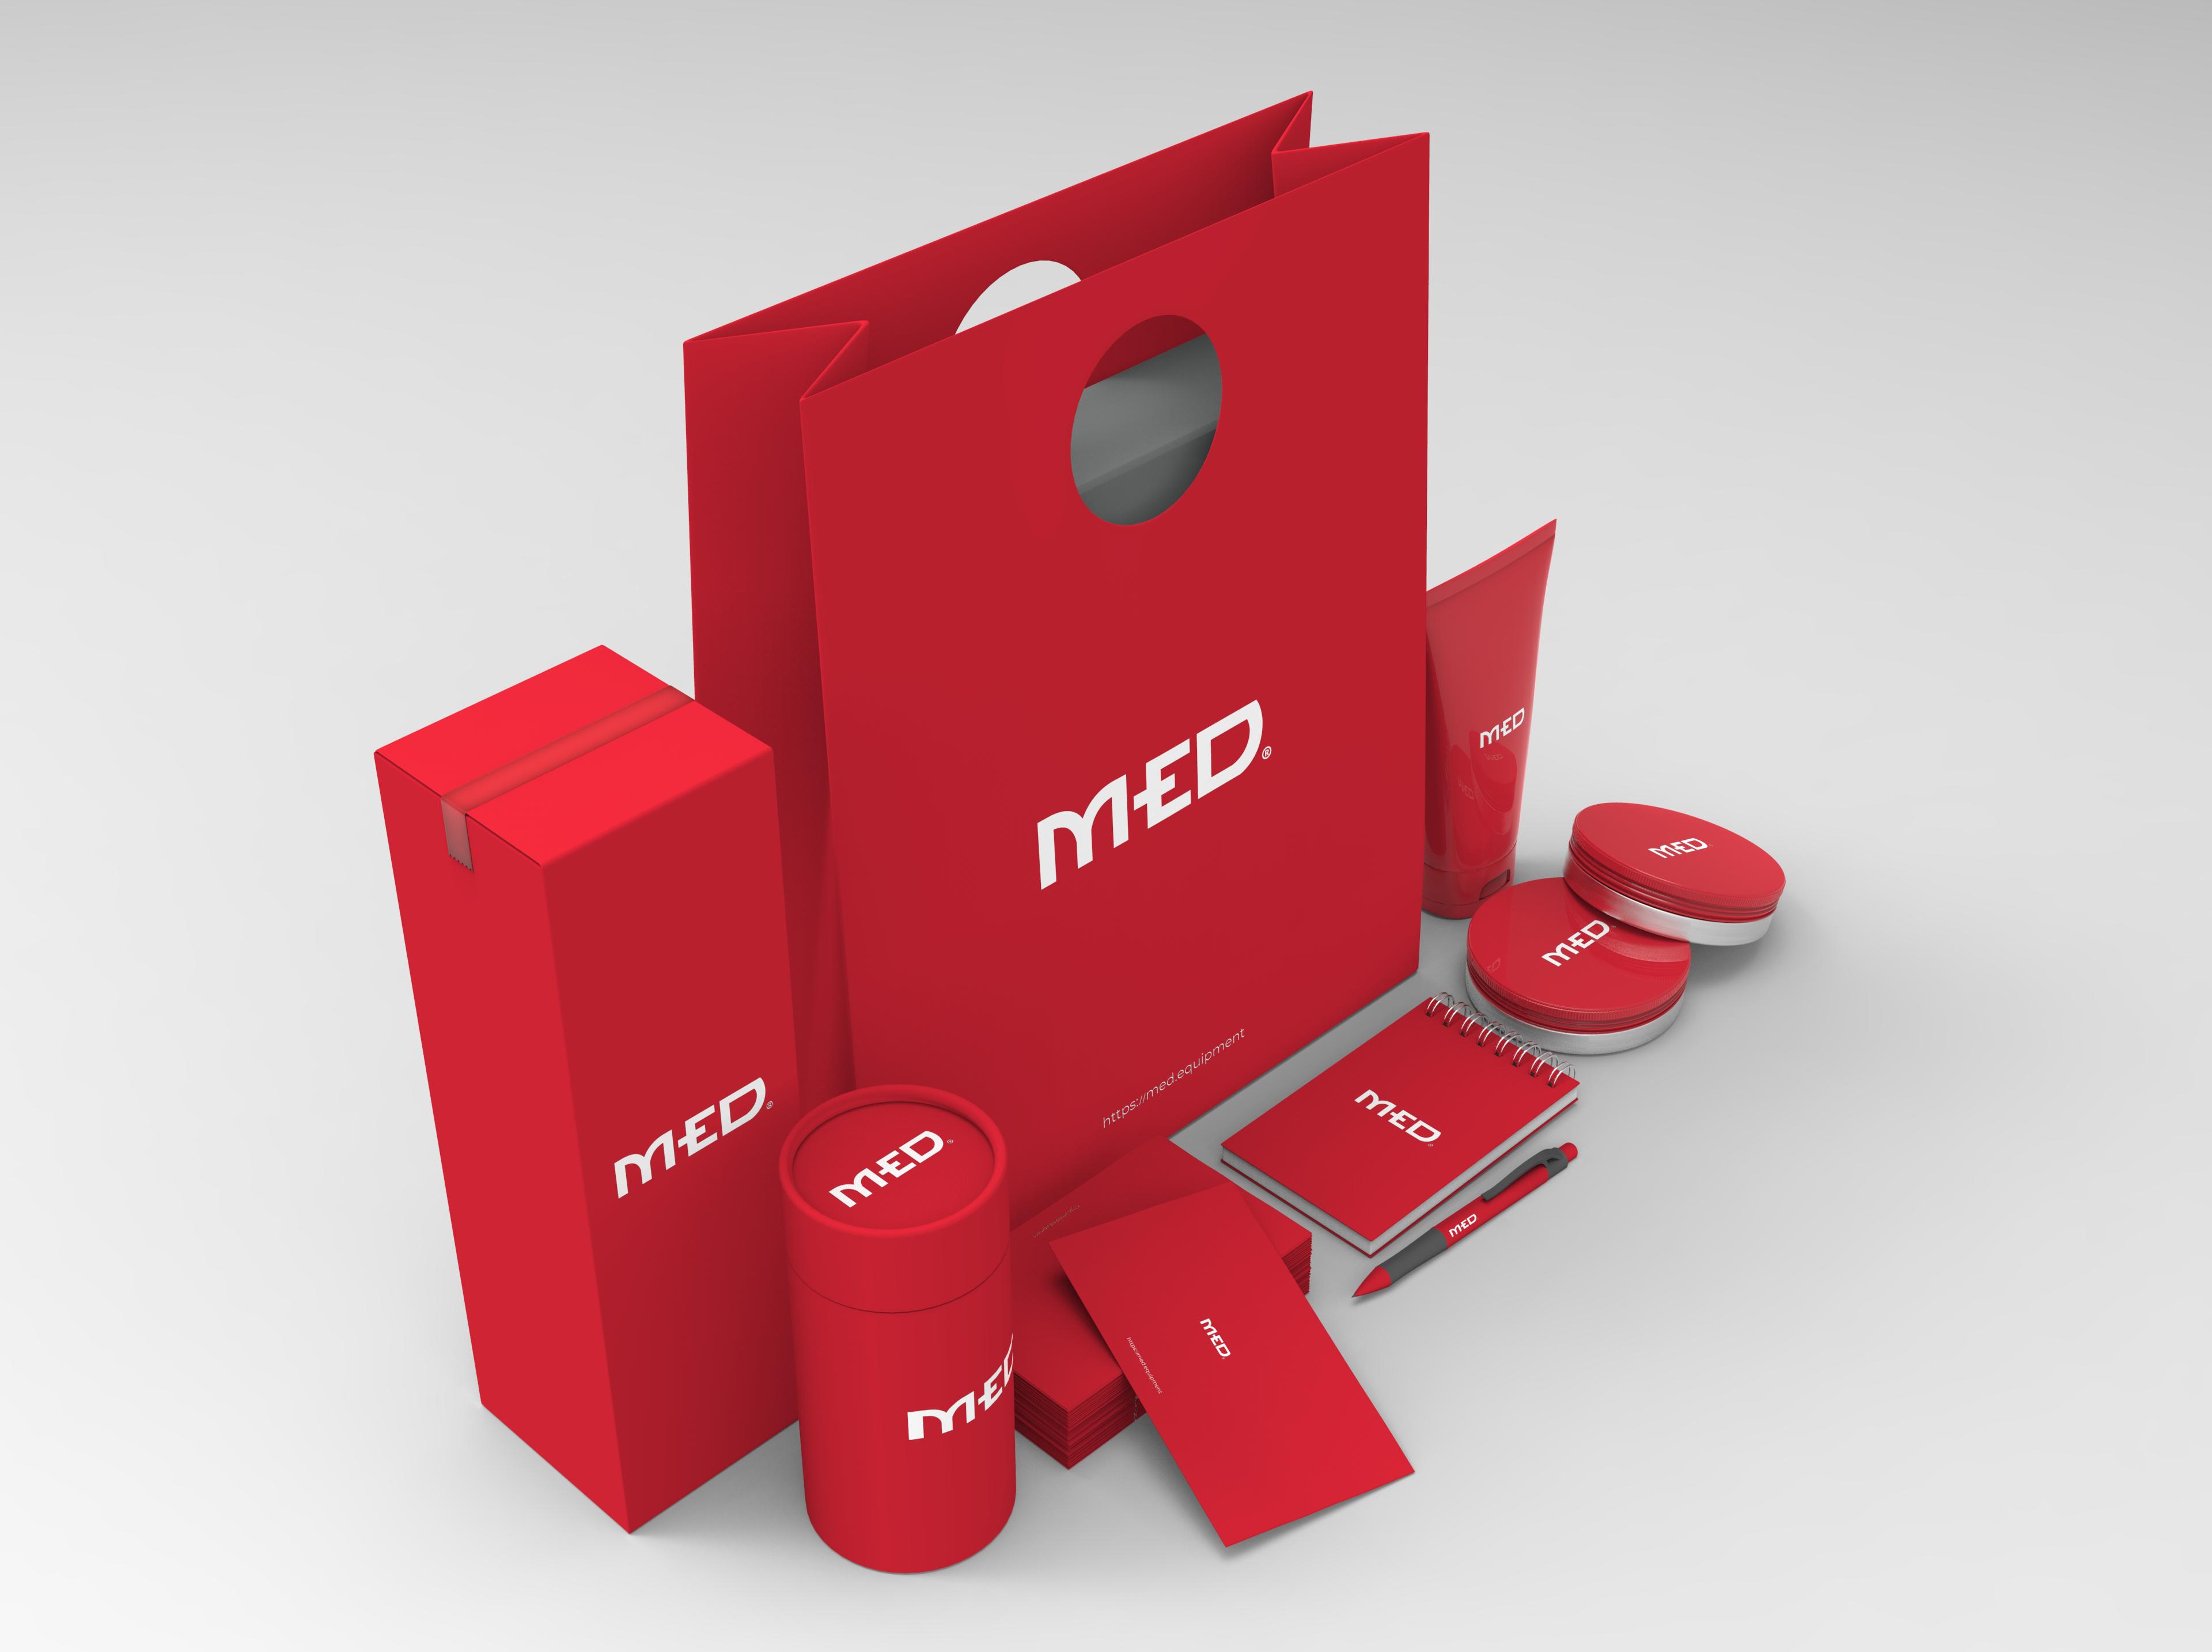 Graphic Design Head Image